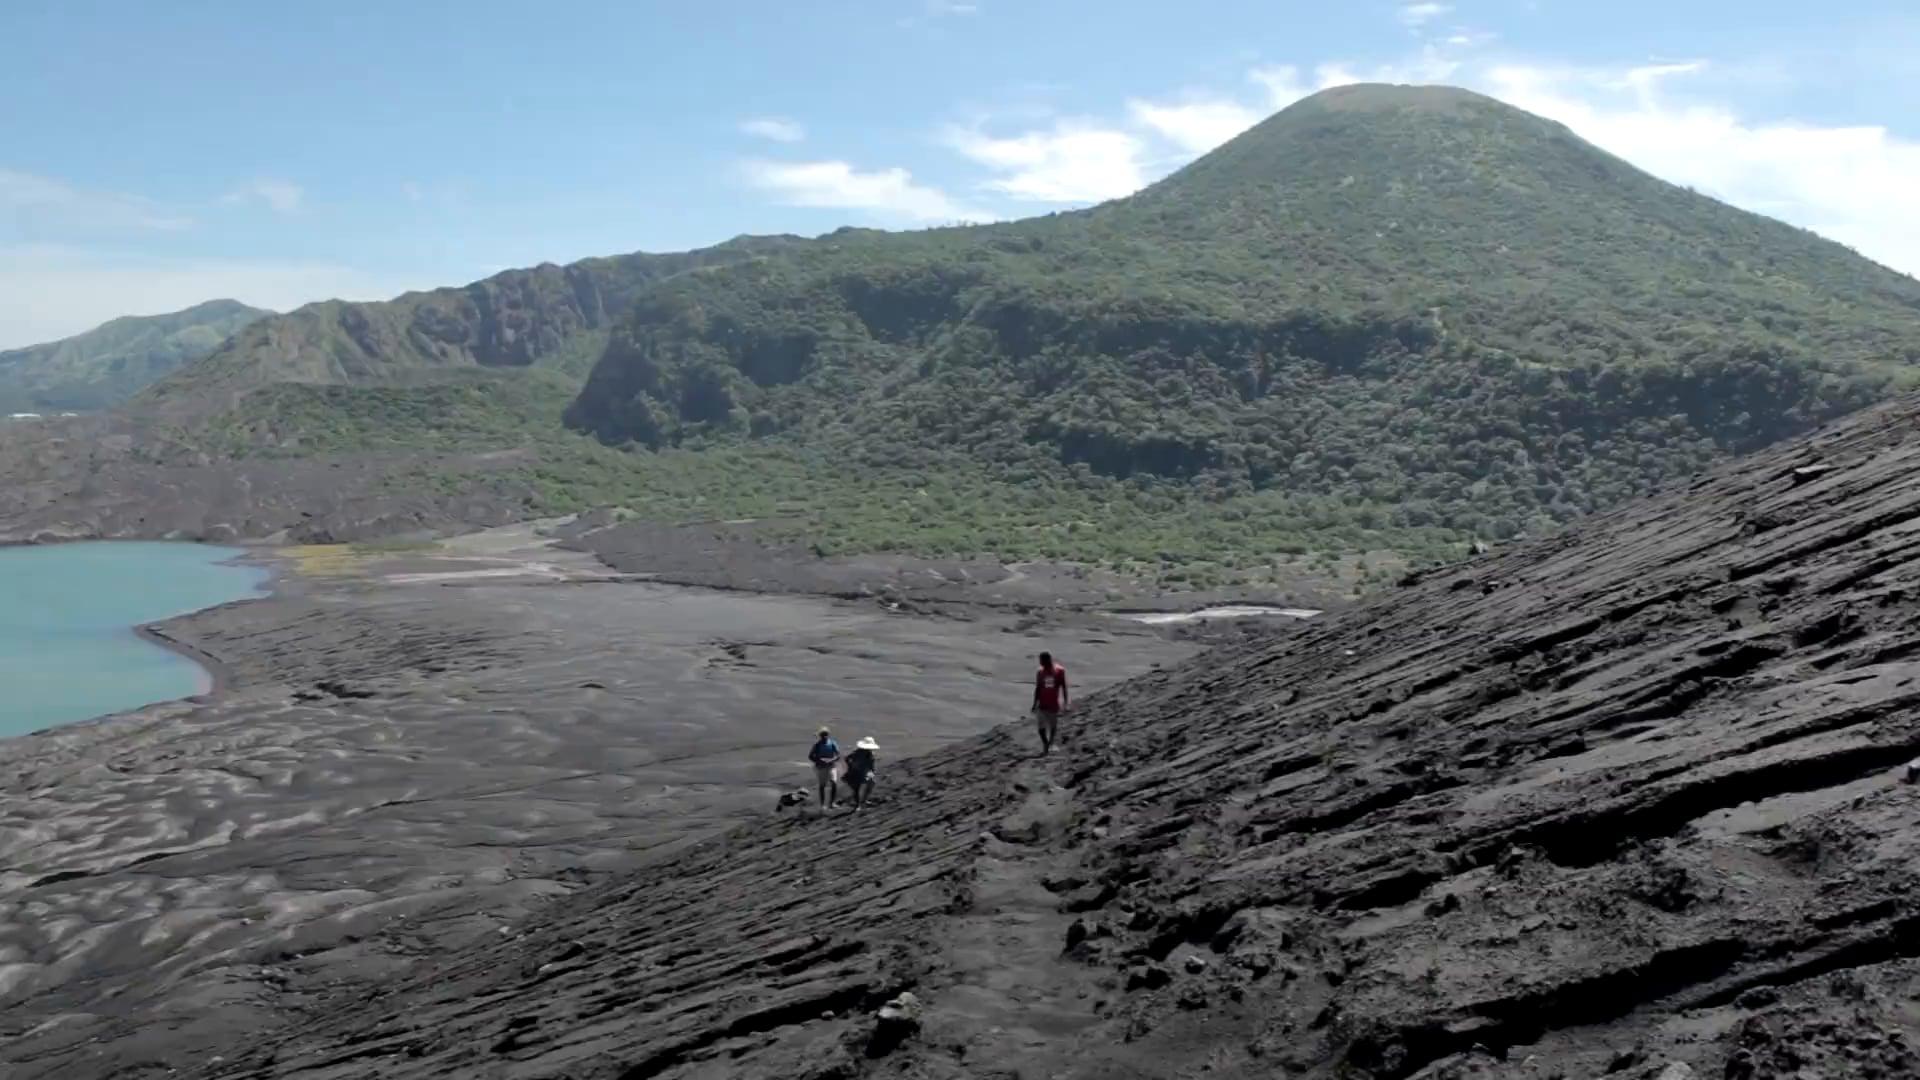 FOOD BOWL PAPUA NEW GUINEA - episode #3